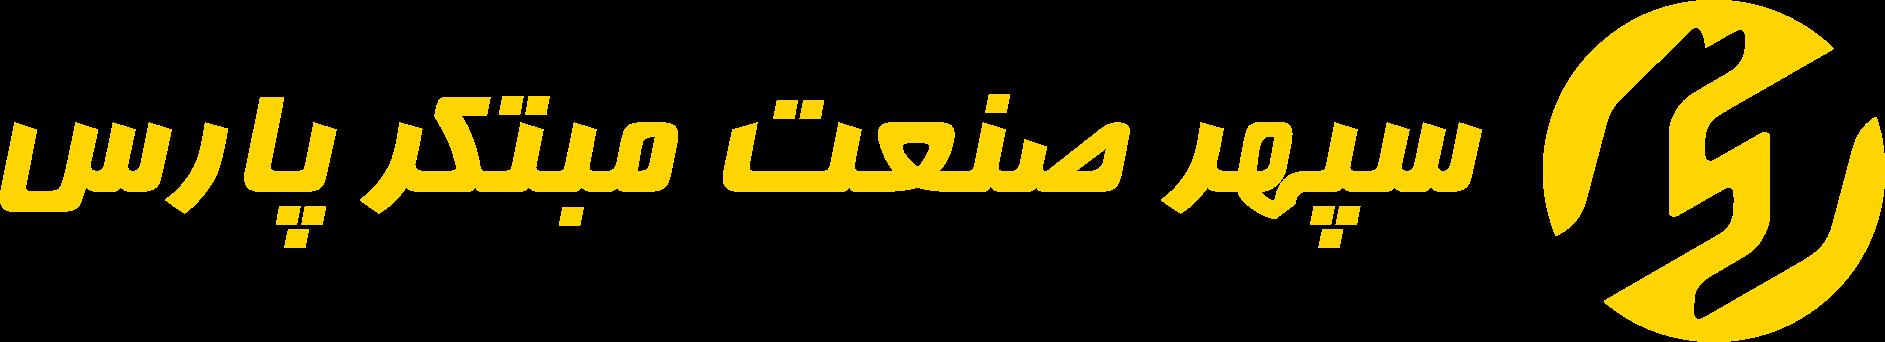 شرکت سپهر صنعت مبتکر پارس